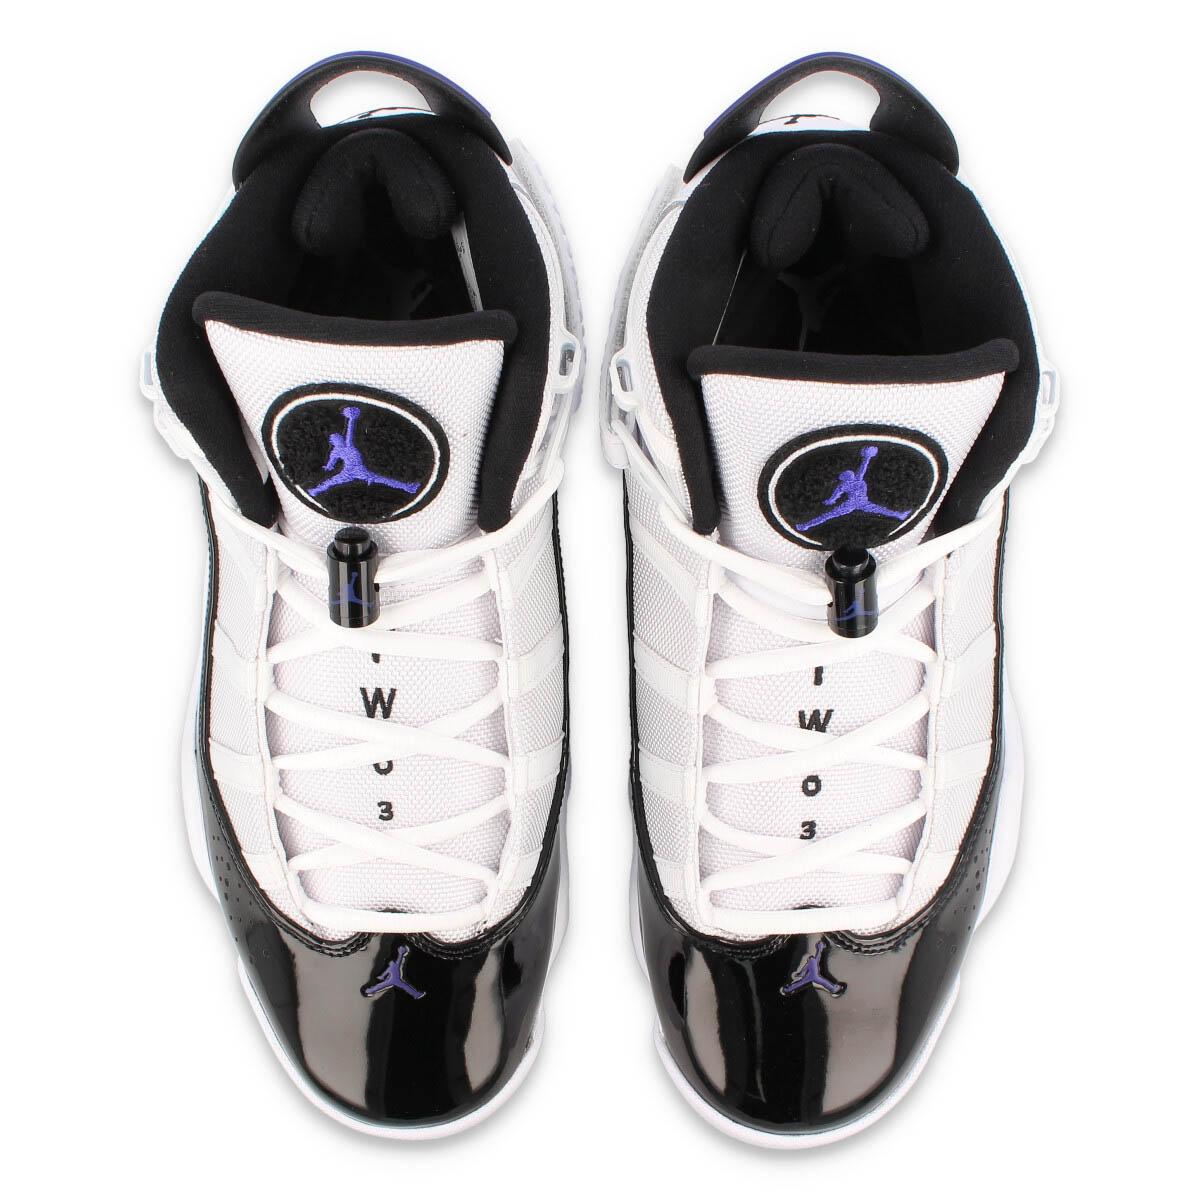 af75149e7a9 SELECT SHOP LOWTEX  NIKE AIR JORDAN 6 RINGS Nike Air Jordan 6 RINGS ...